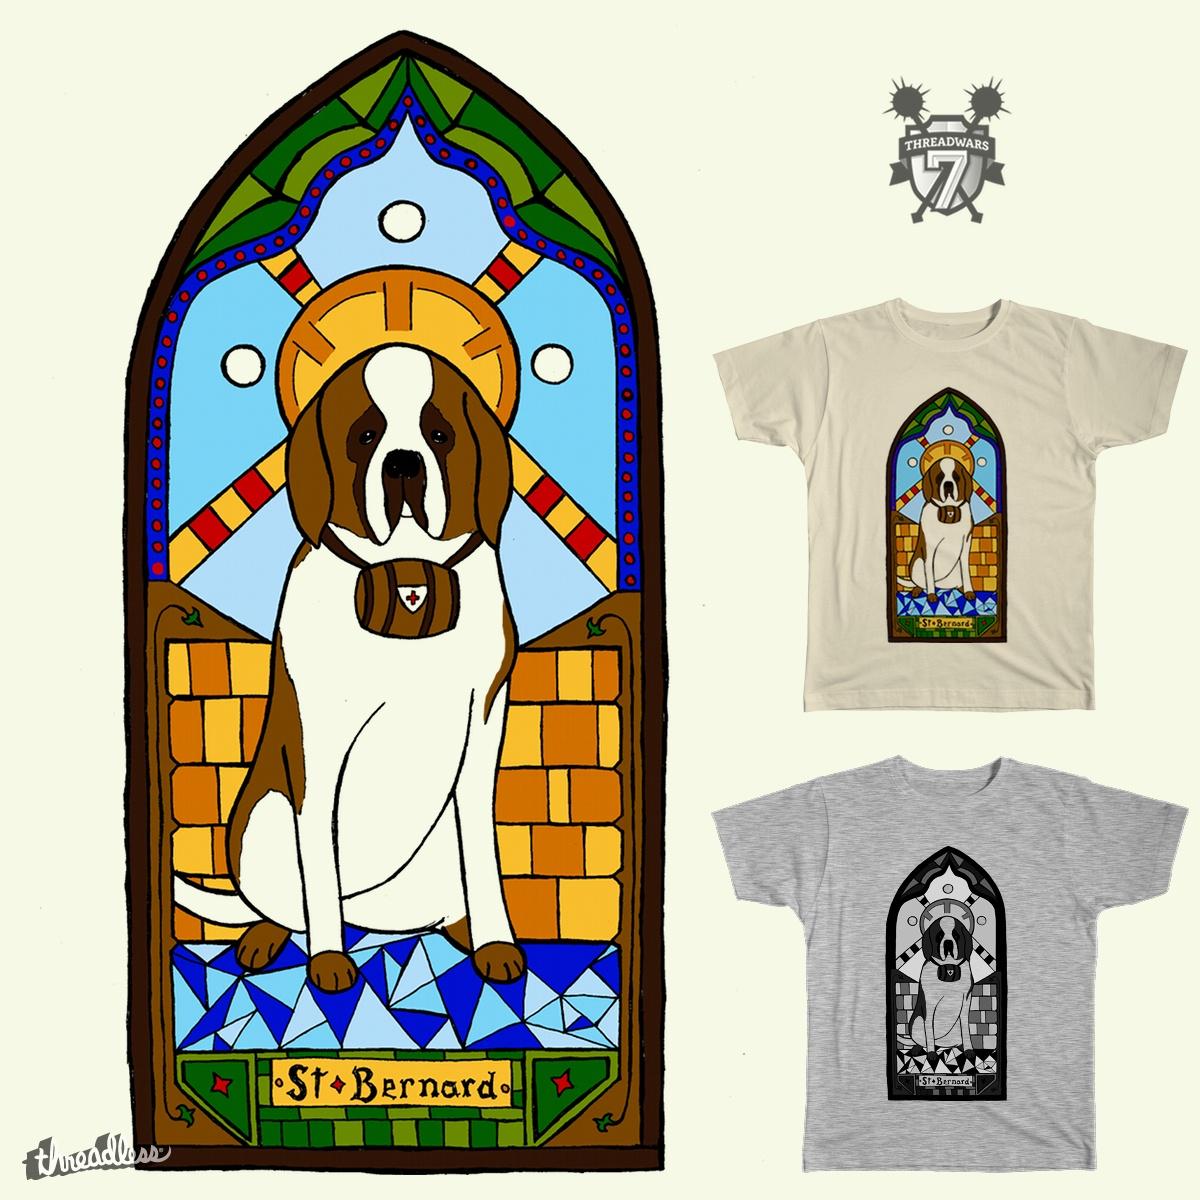 St. Bernard by AnthonyMoore on Threadless